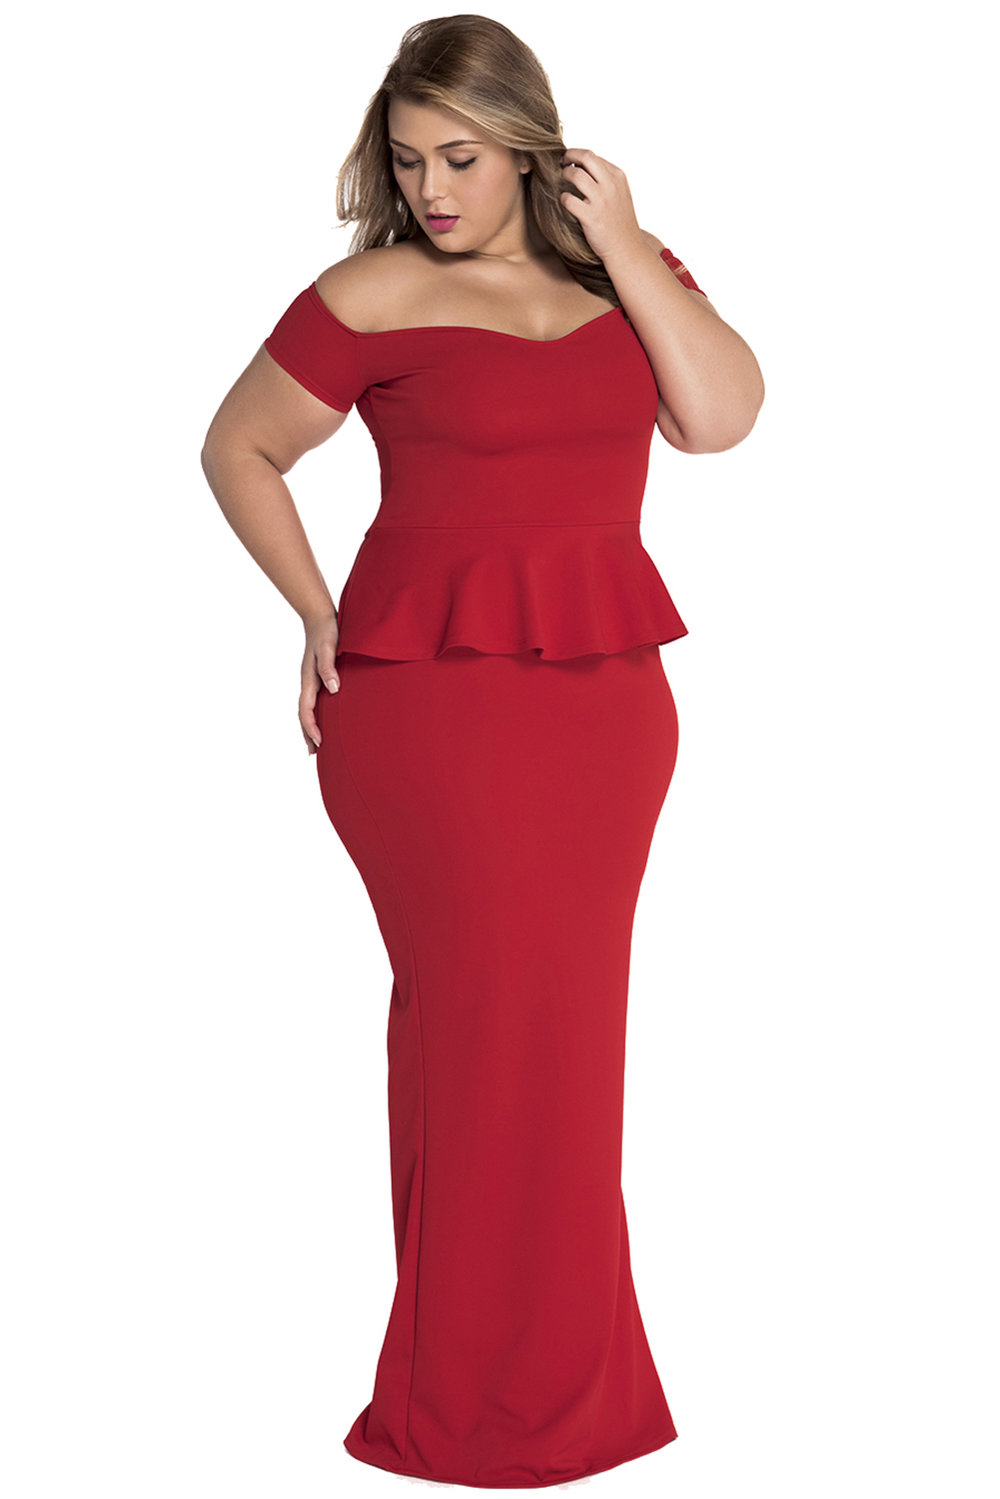 Jas Fashion-Shadow\'s Delight Off Shoulder Peplum Dress